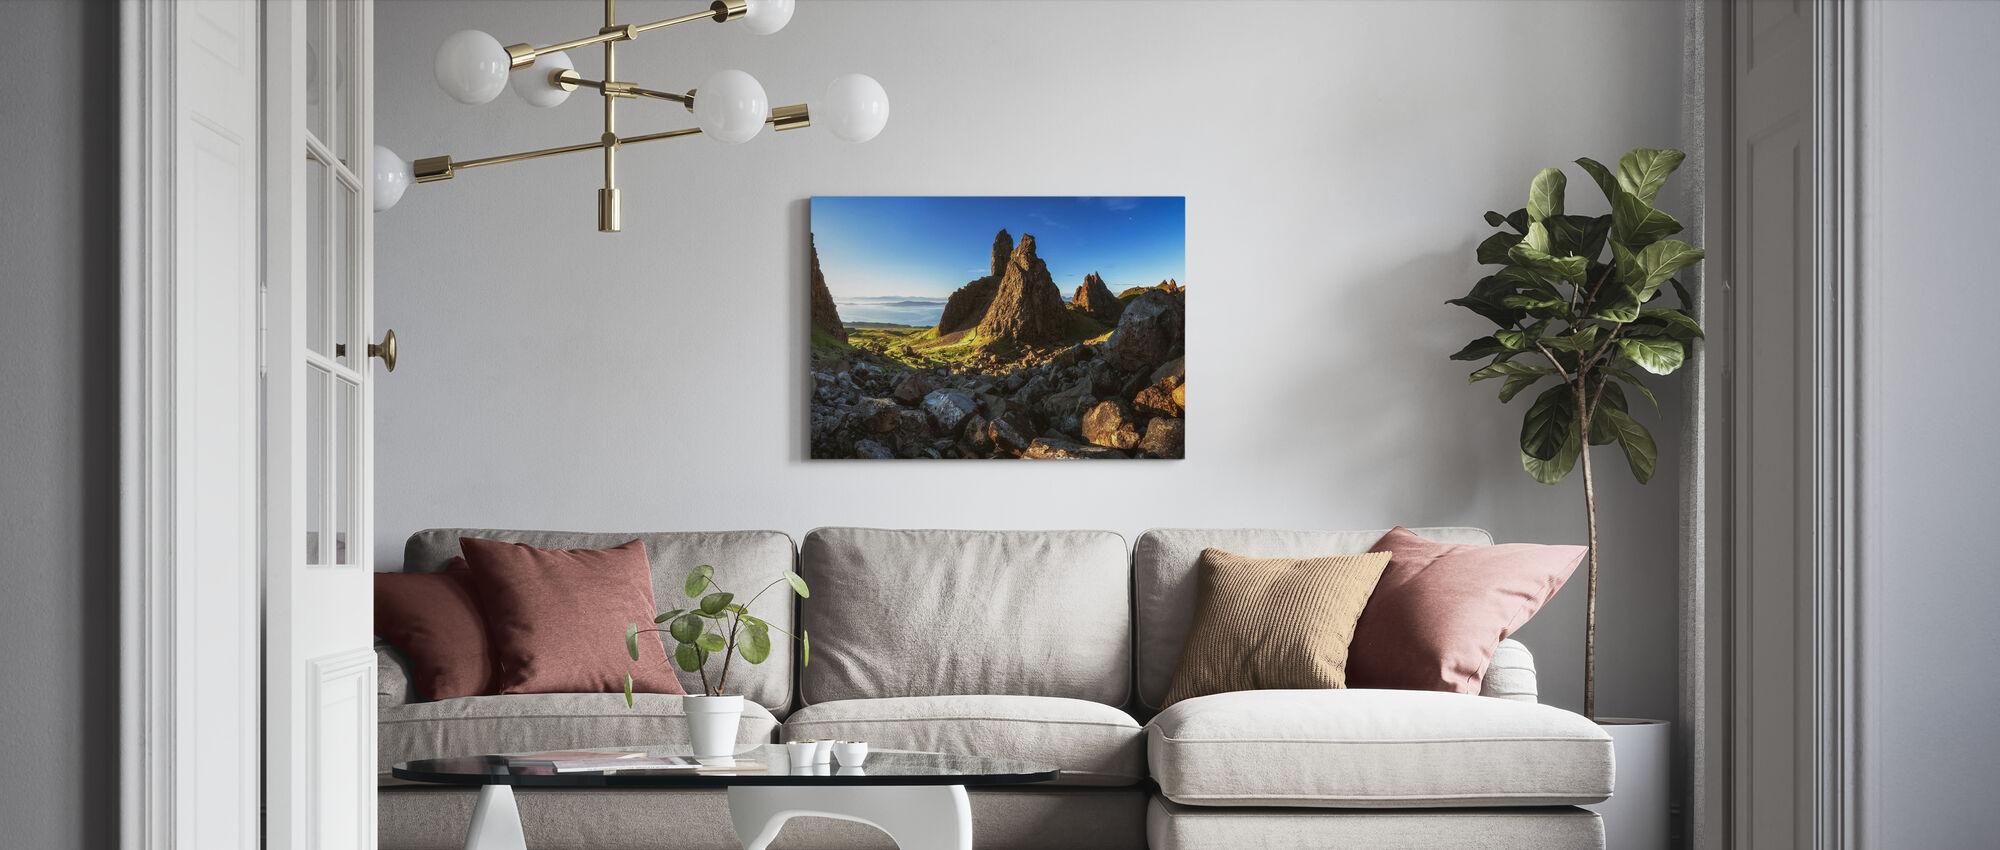 Old Man Storr - Canvas print - Living Room